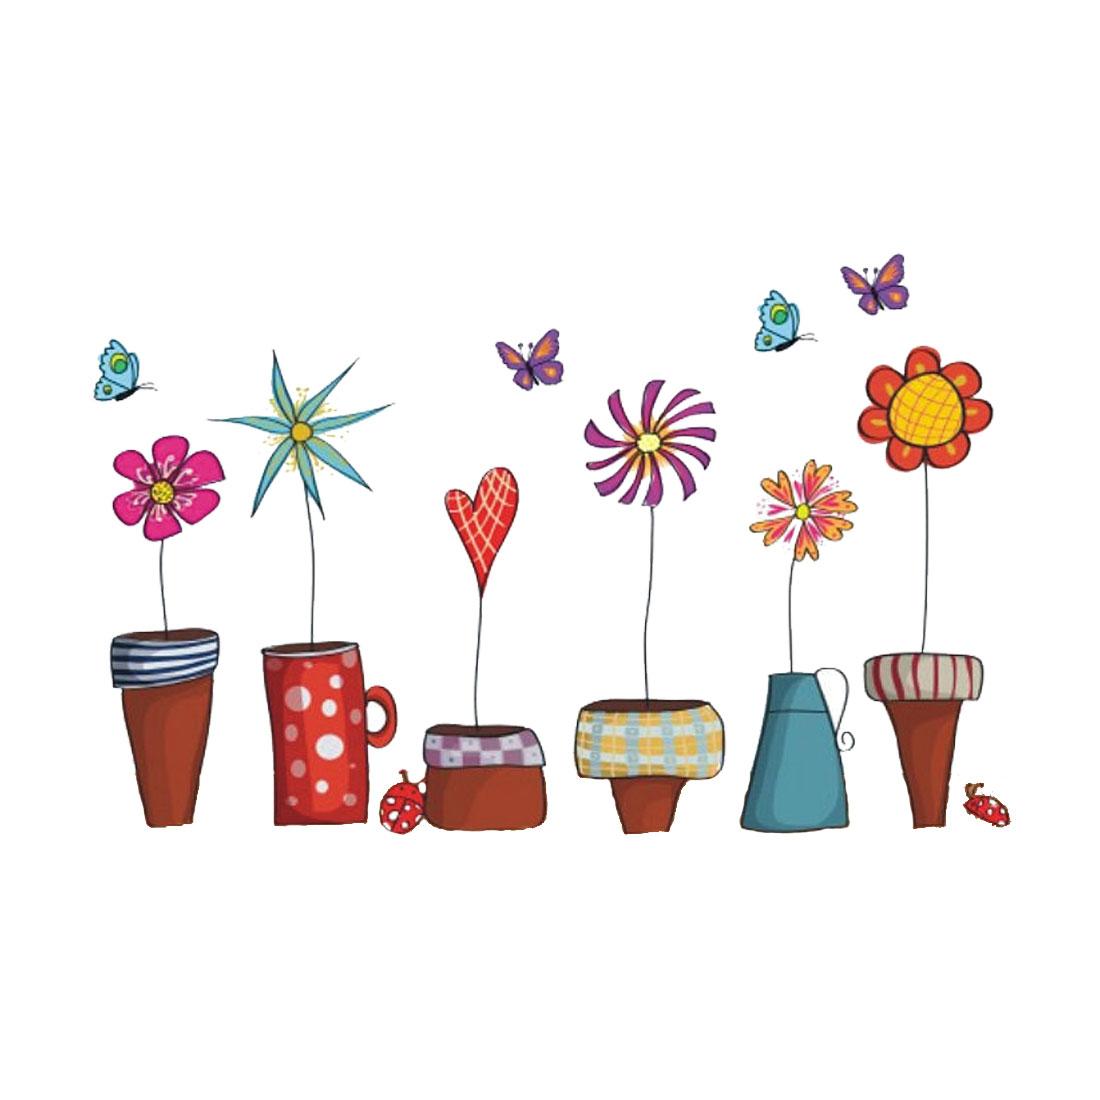 Cartoon Flower Pot Wall Stickers Self-stick Artificial Decal for Bedroom